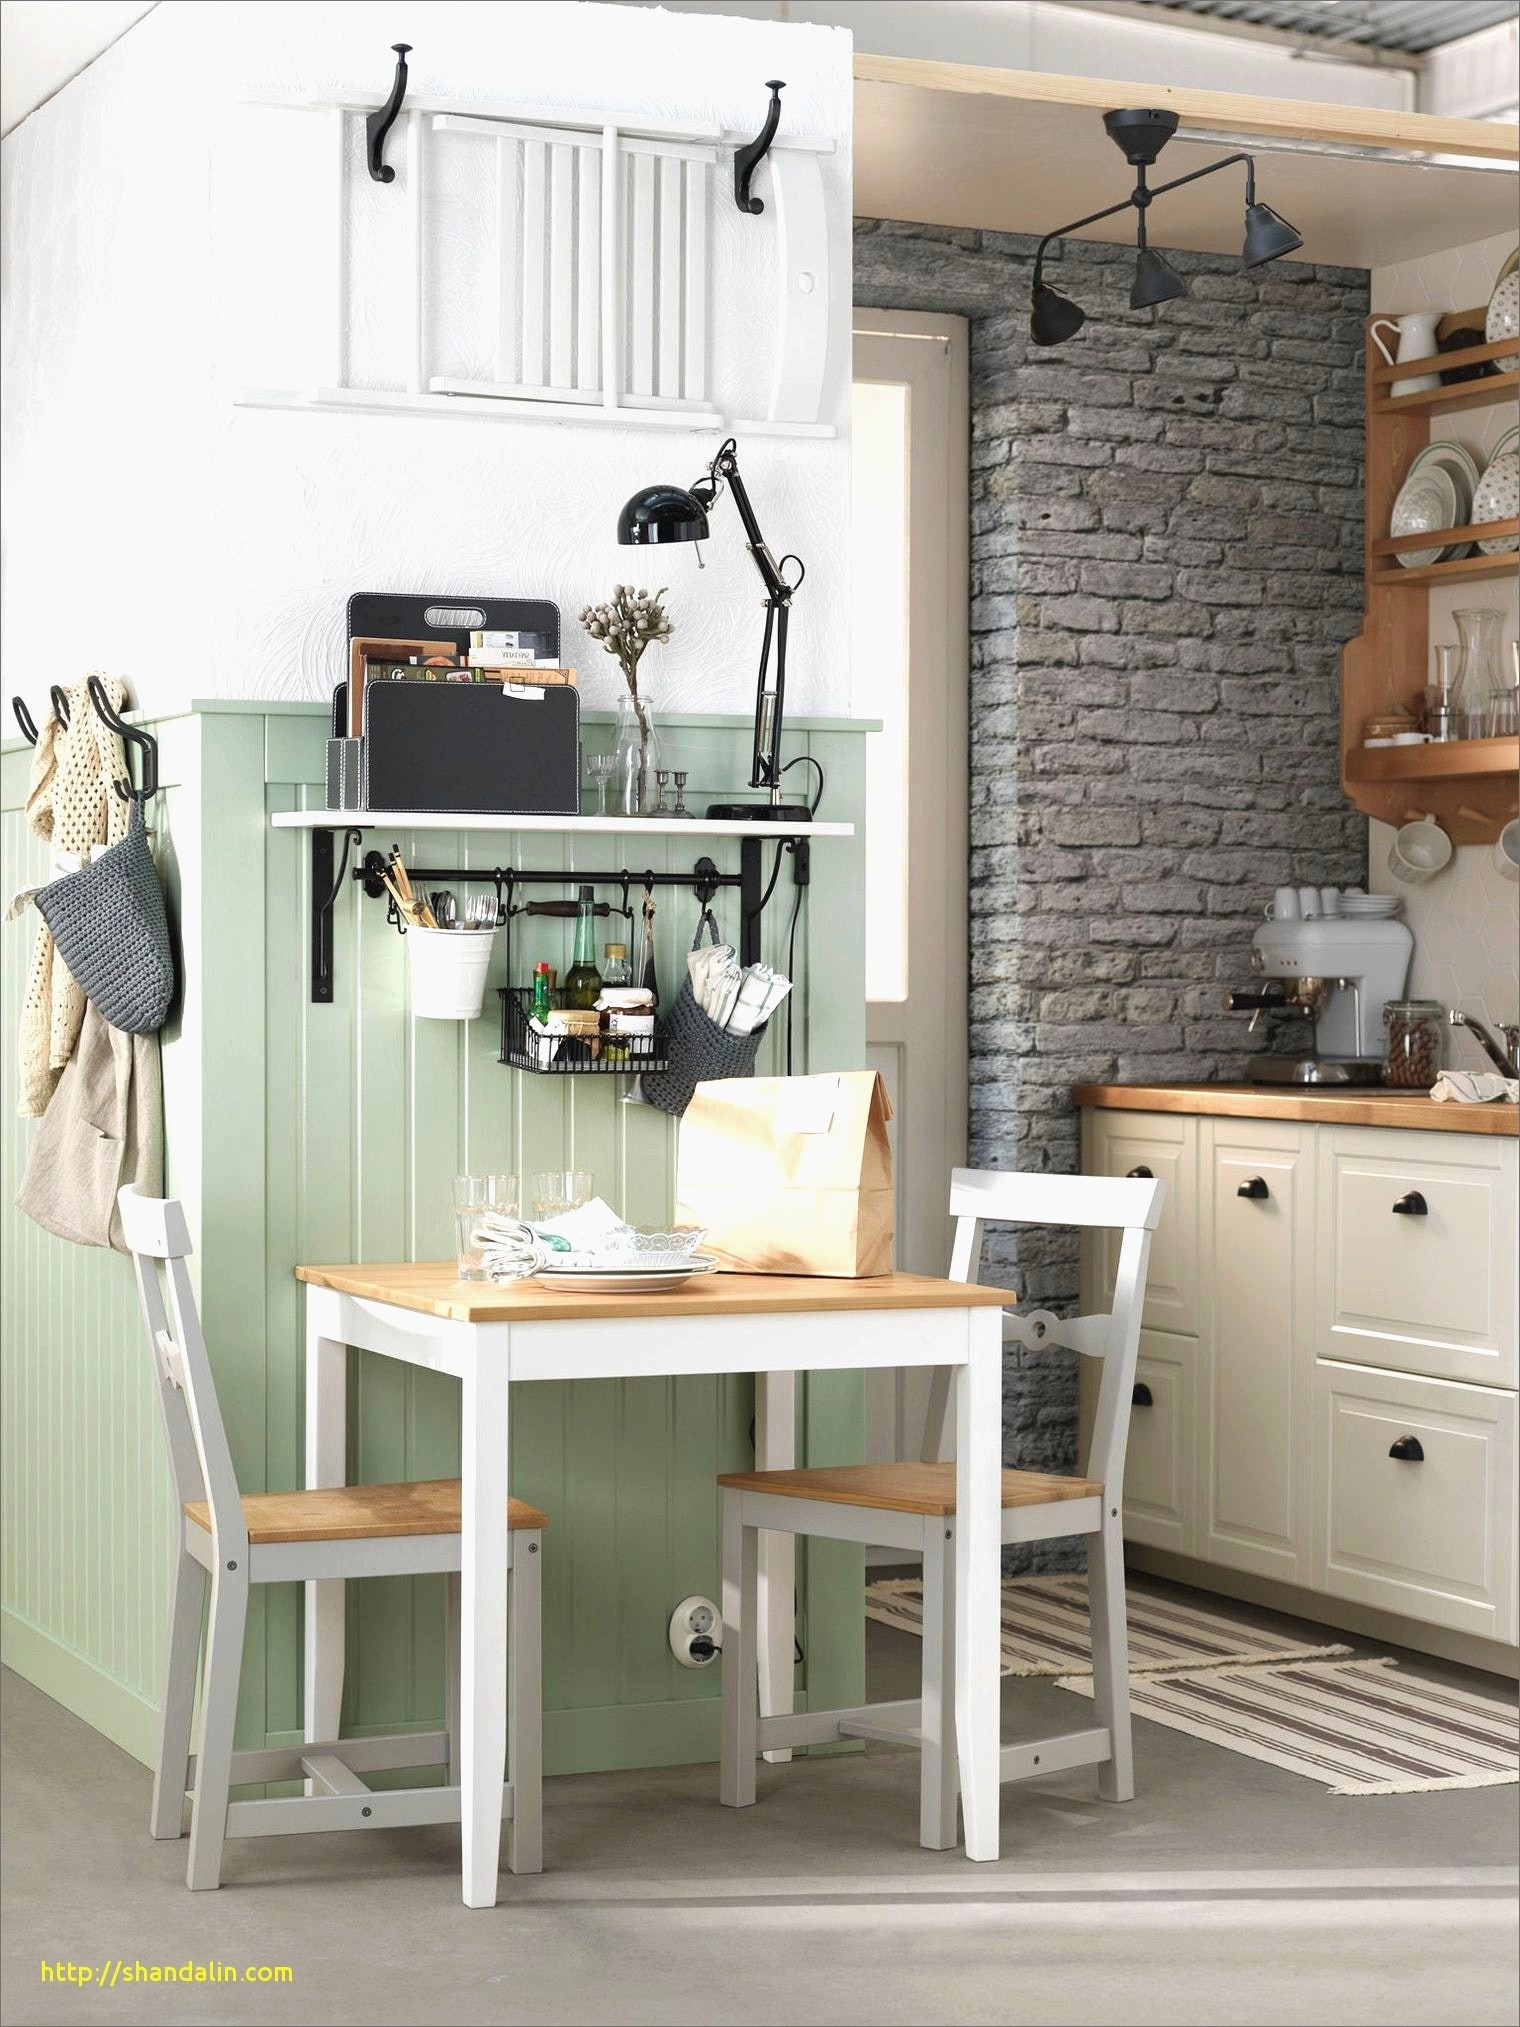 Ikea Cuisine Laxarby Beau Stock Nouveau Cuisine Laxarby Pour 59 Beautiful Cuisine Ikea Laxarby